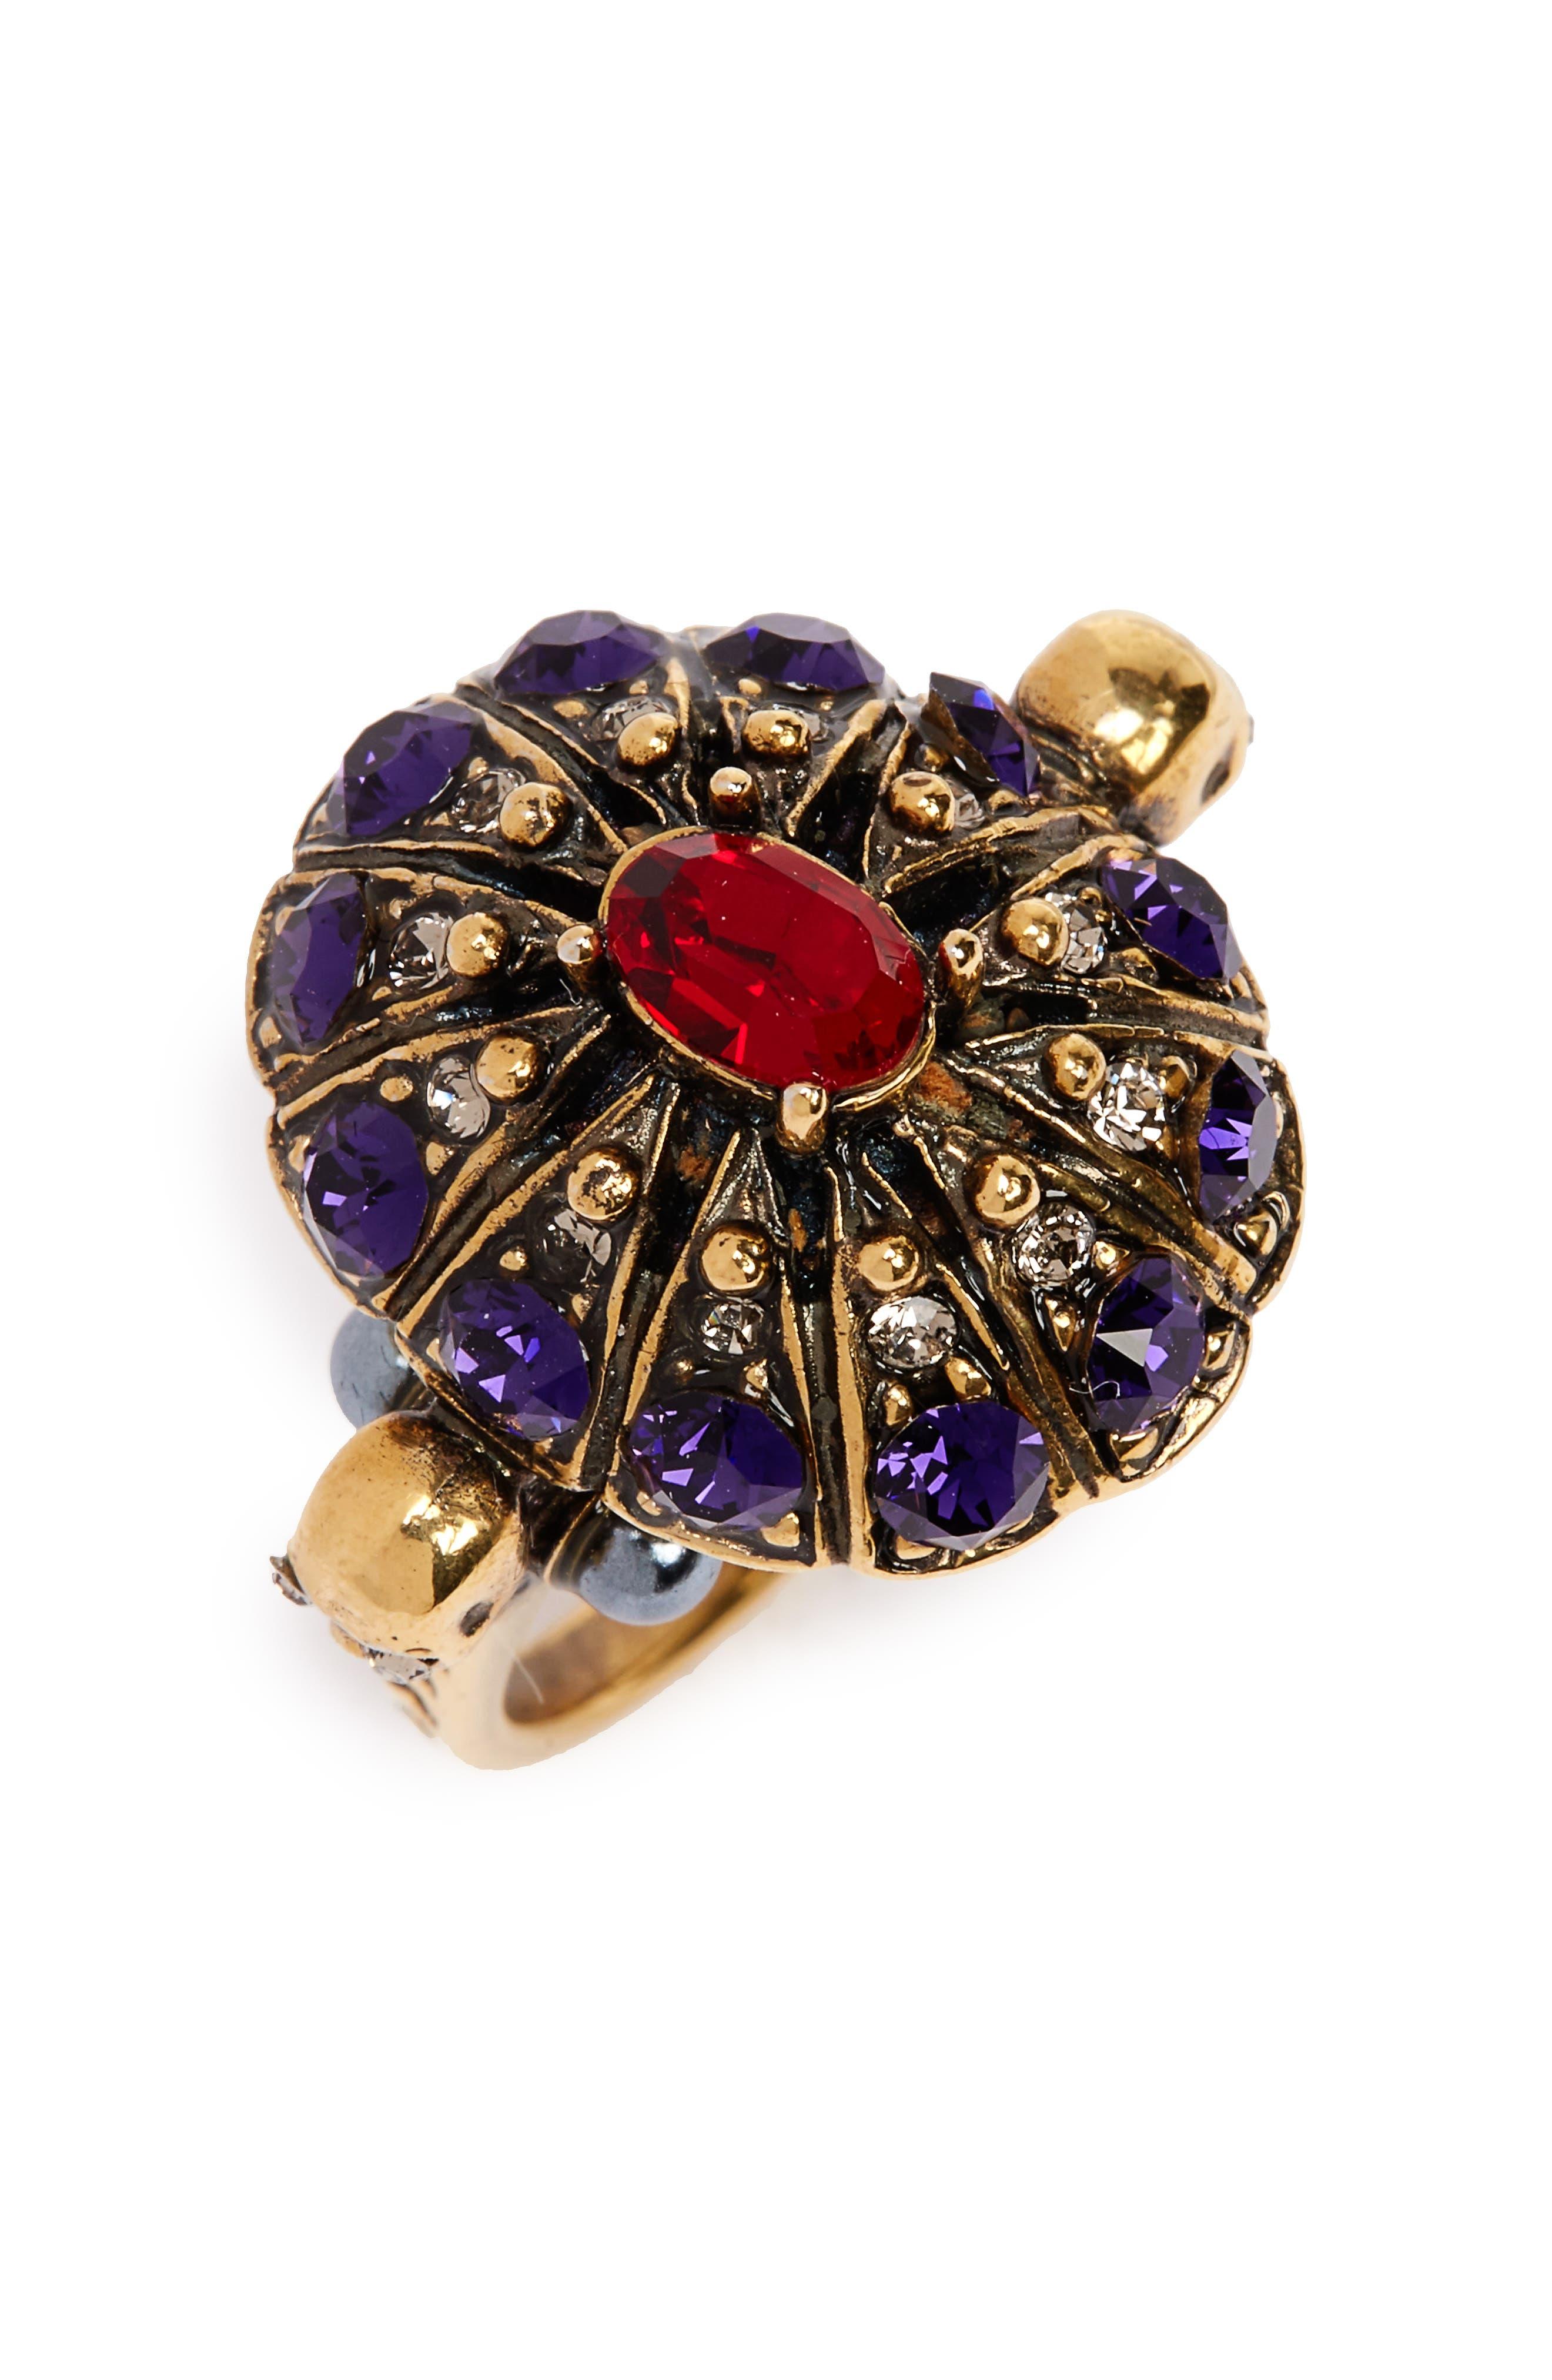 Alternate Image 1 Selected - Alexander McQueen Swarovski Crystal Ring